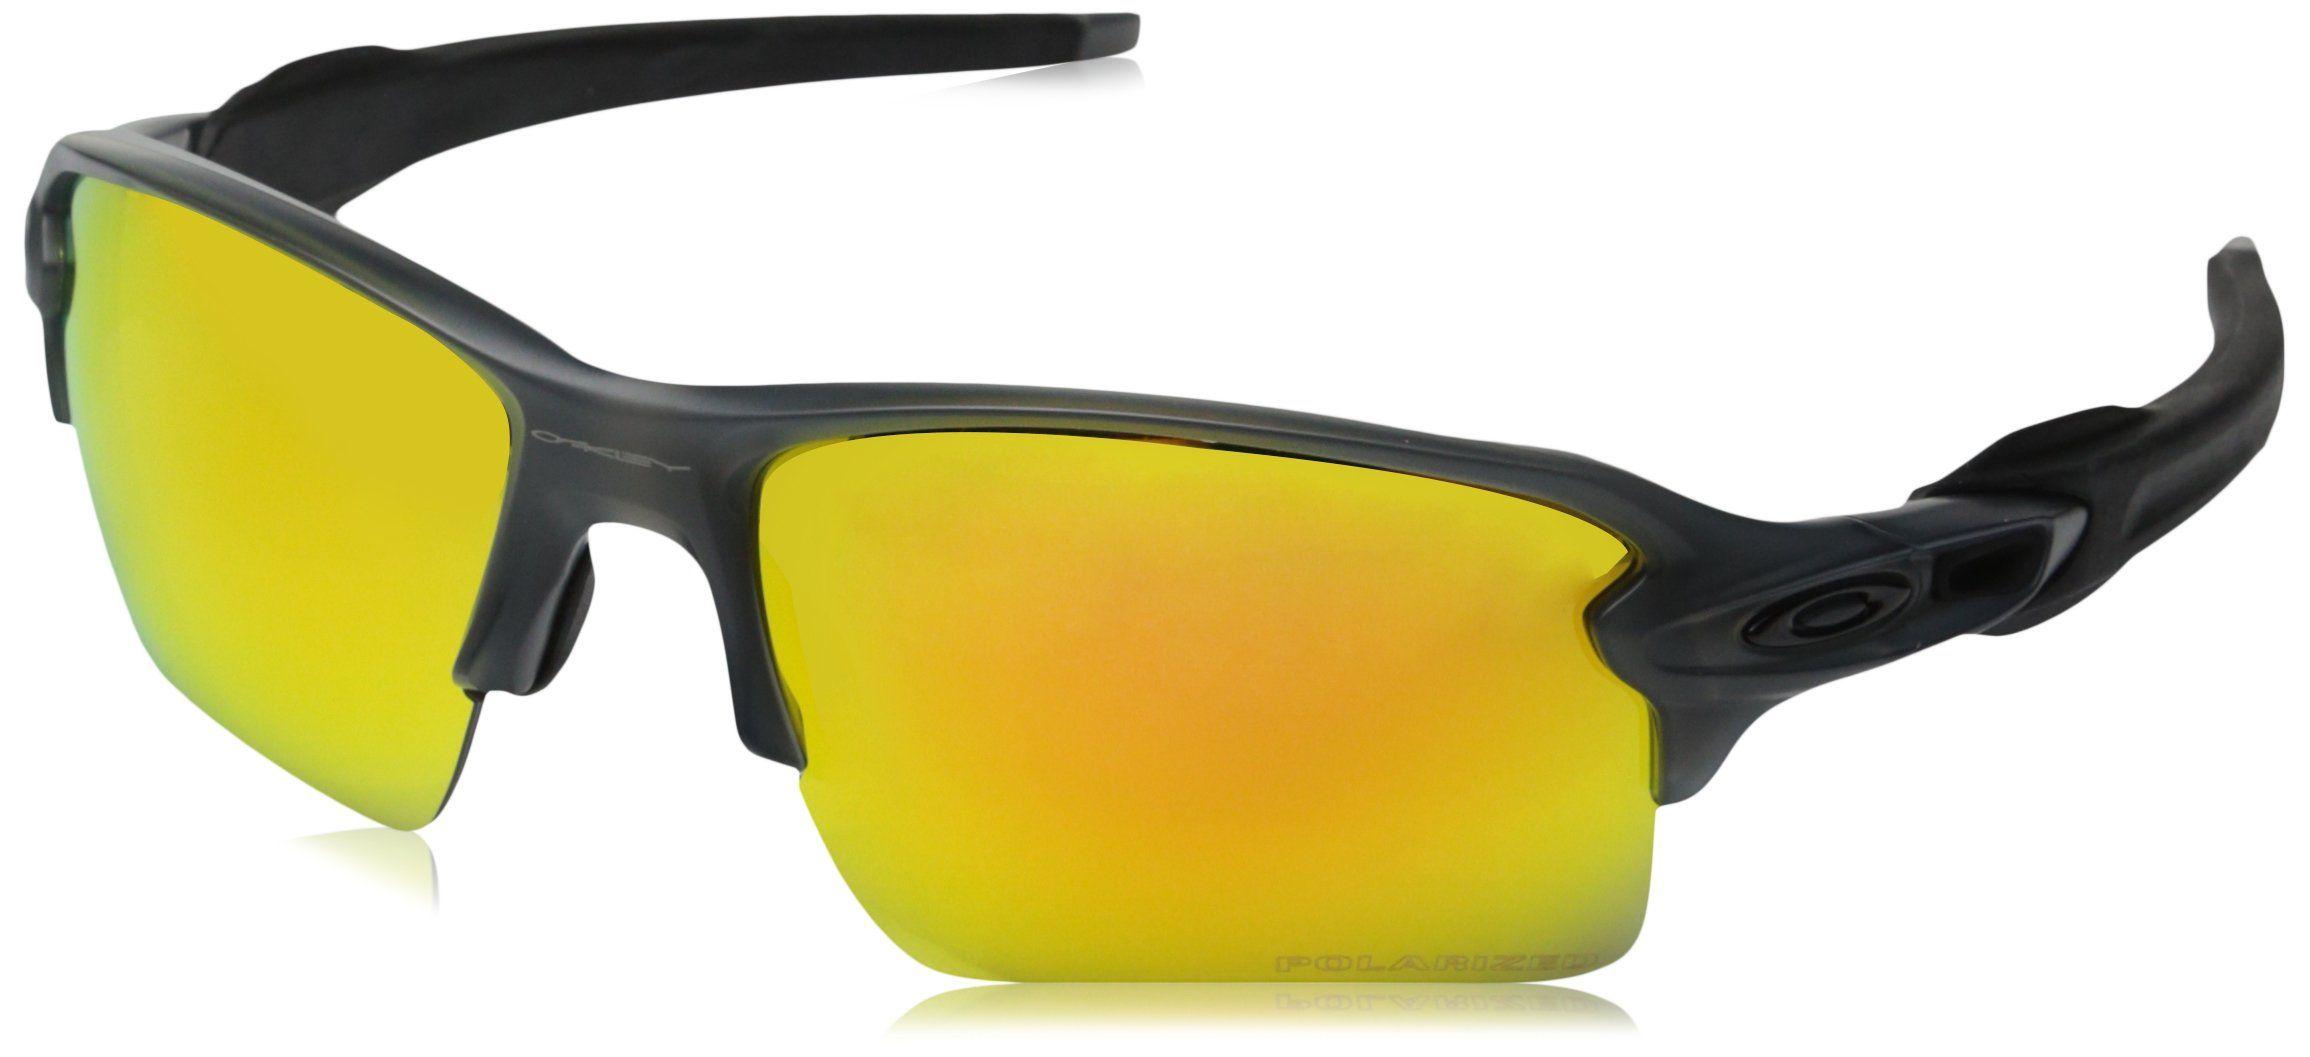 Oakley Men's Flak 2.0 XL OO9188-10 Rectangular Sunglasses, Matte Grey Smoke, 59 mm